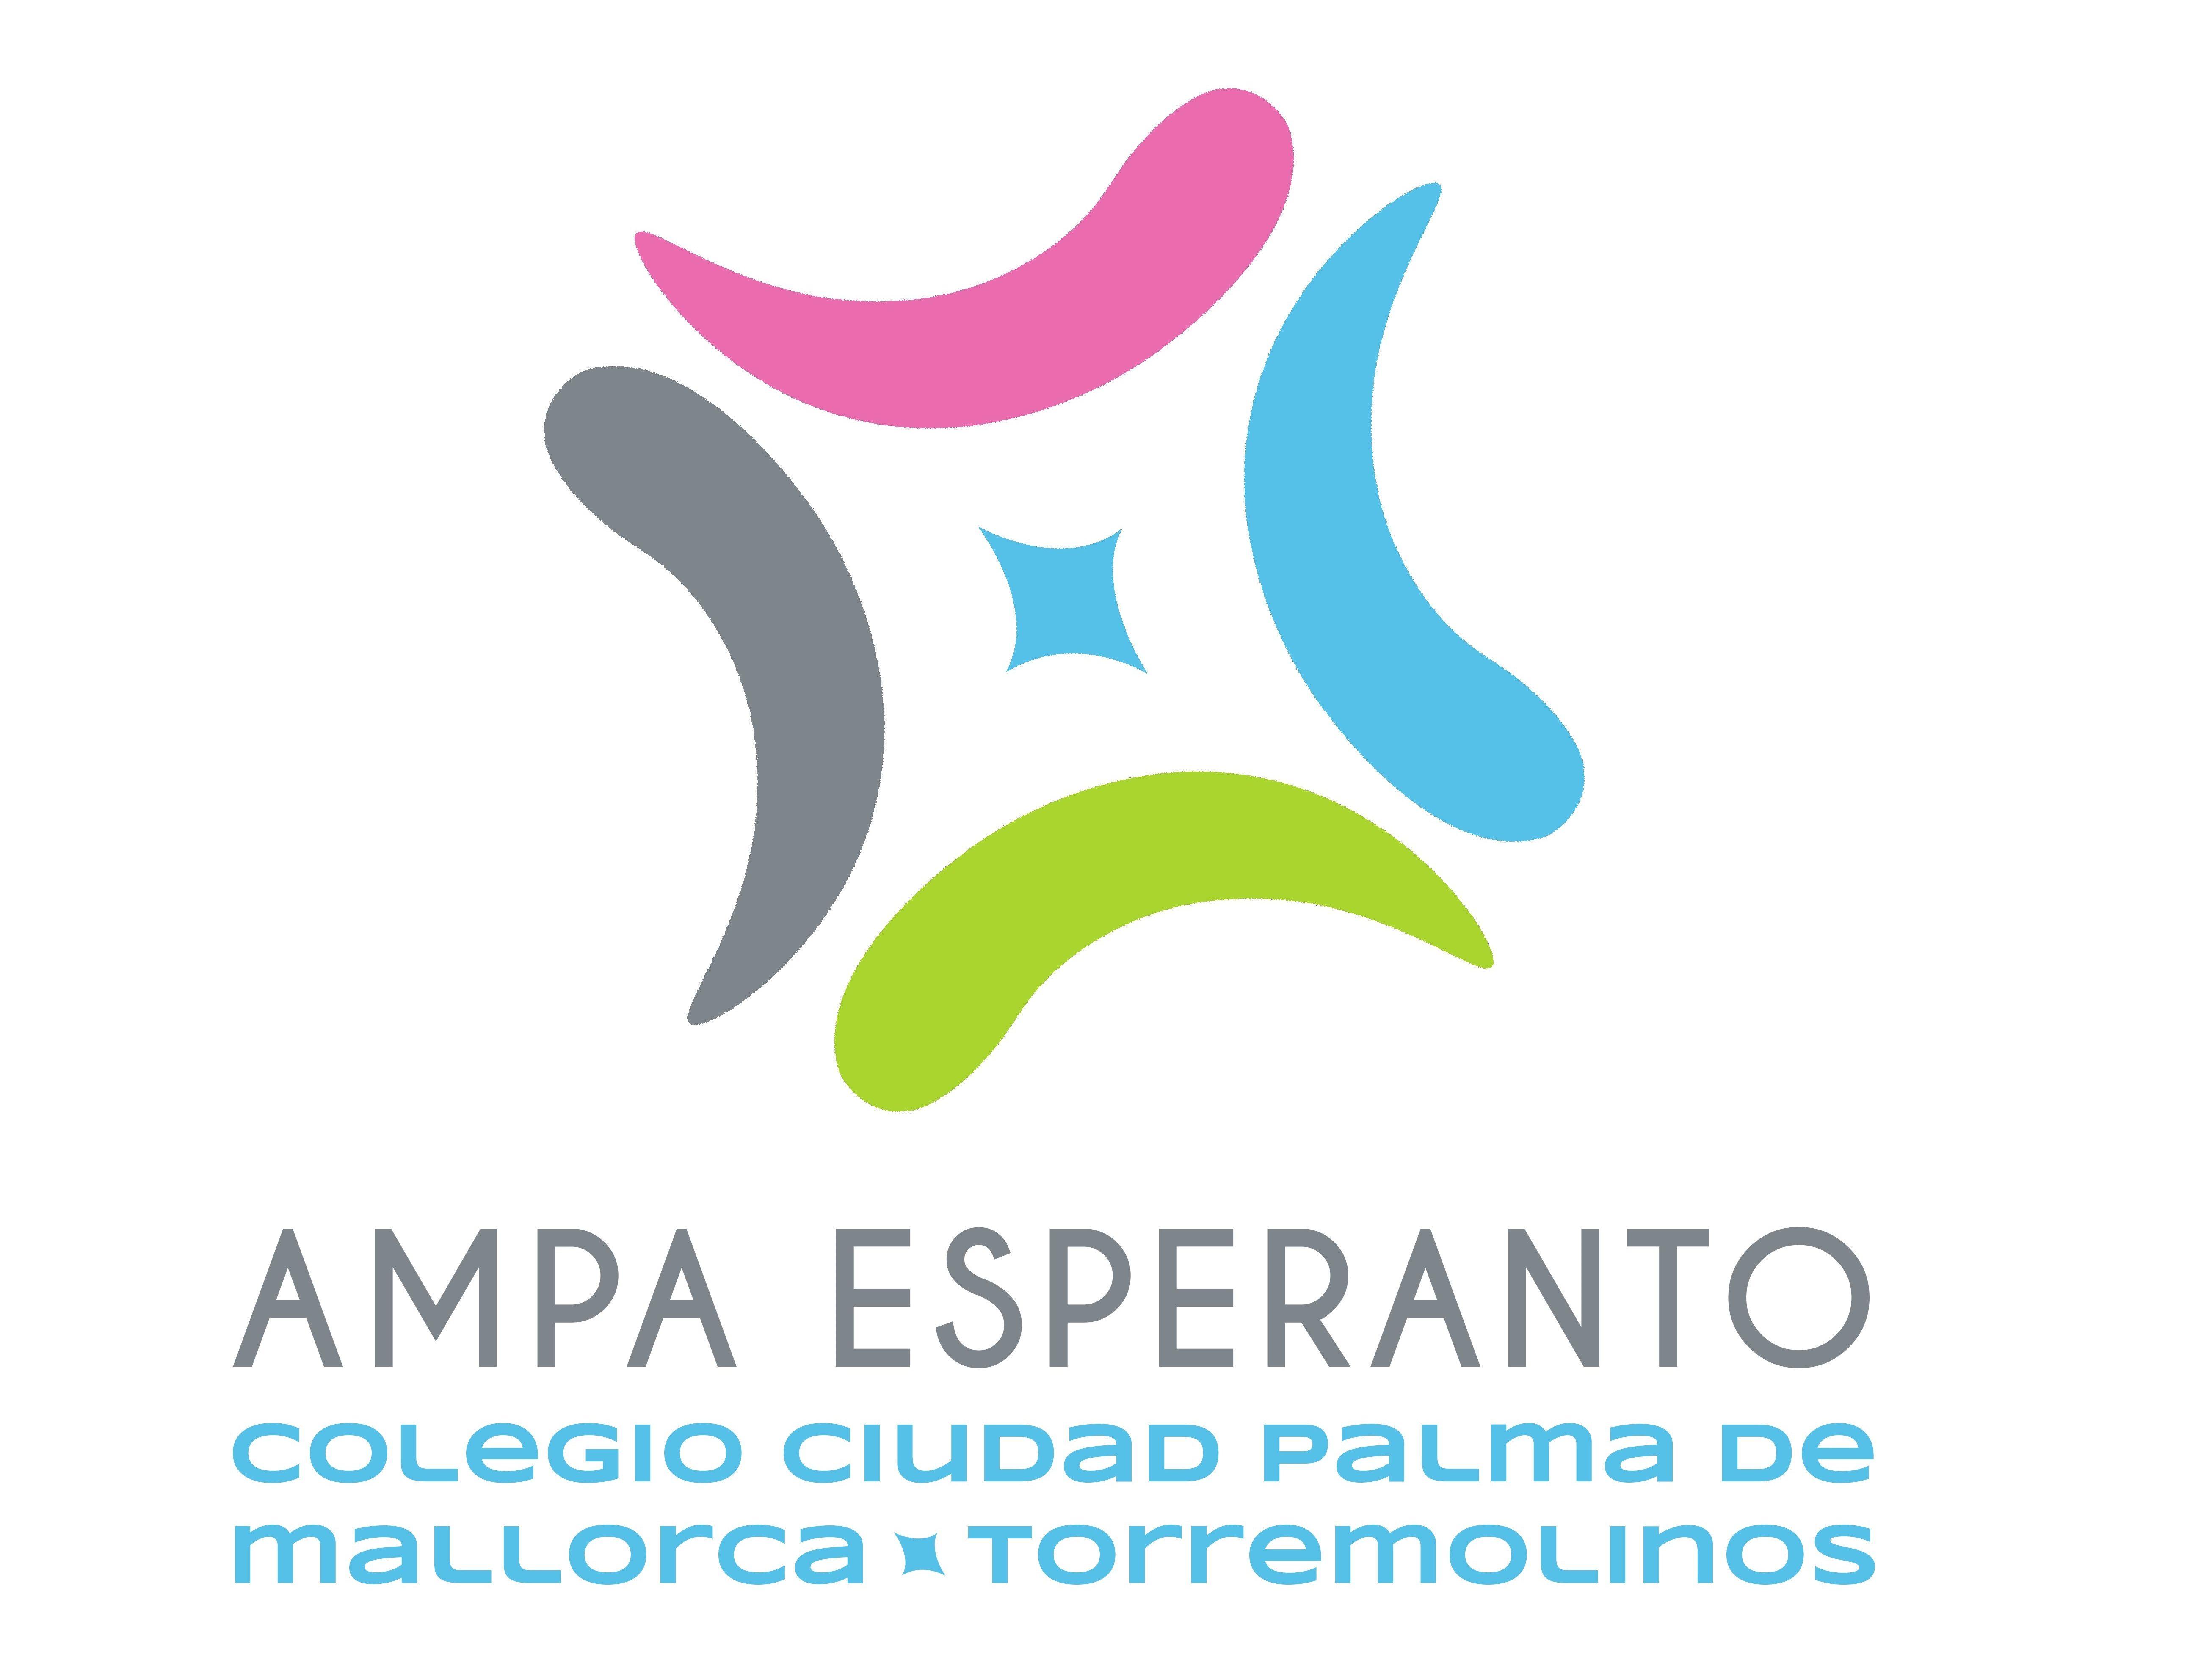 AMPA Esperanto